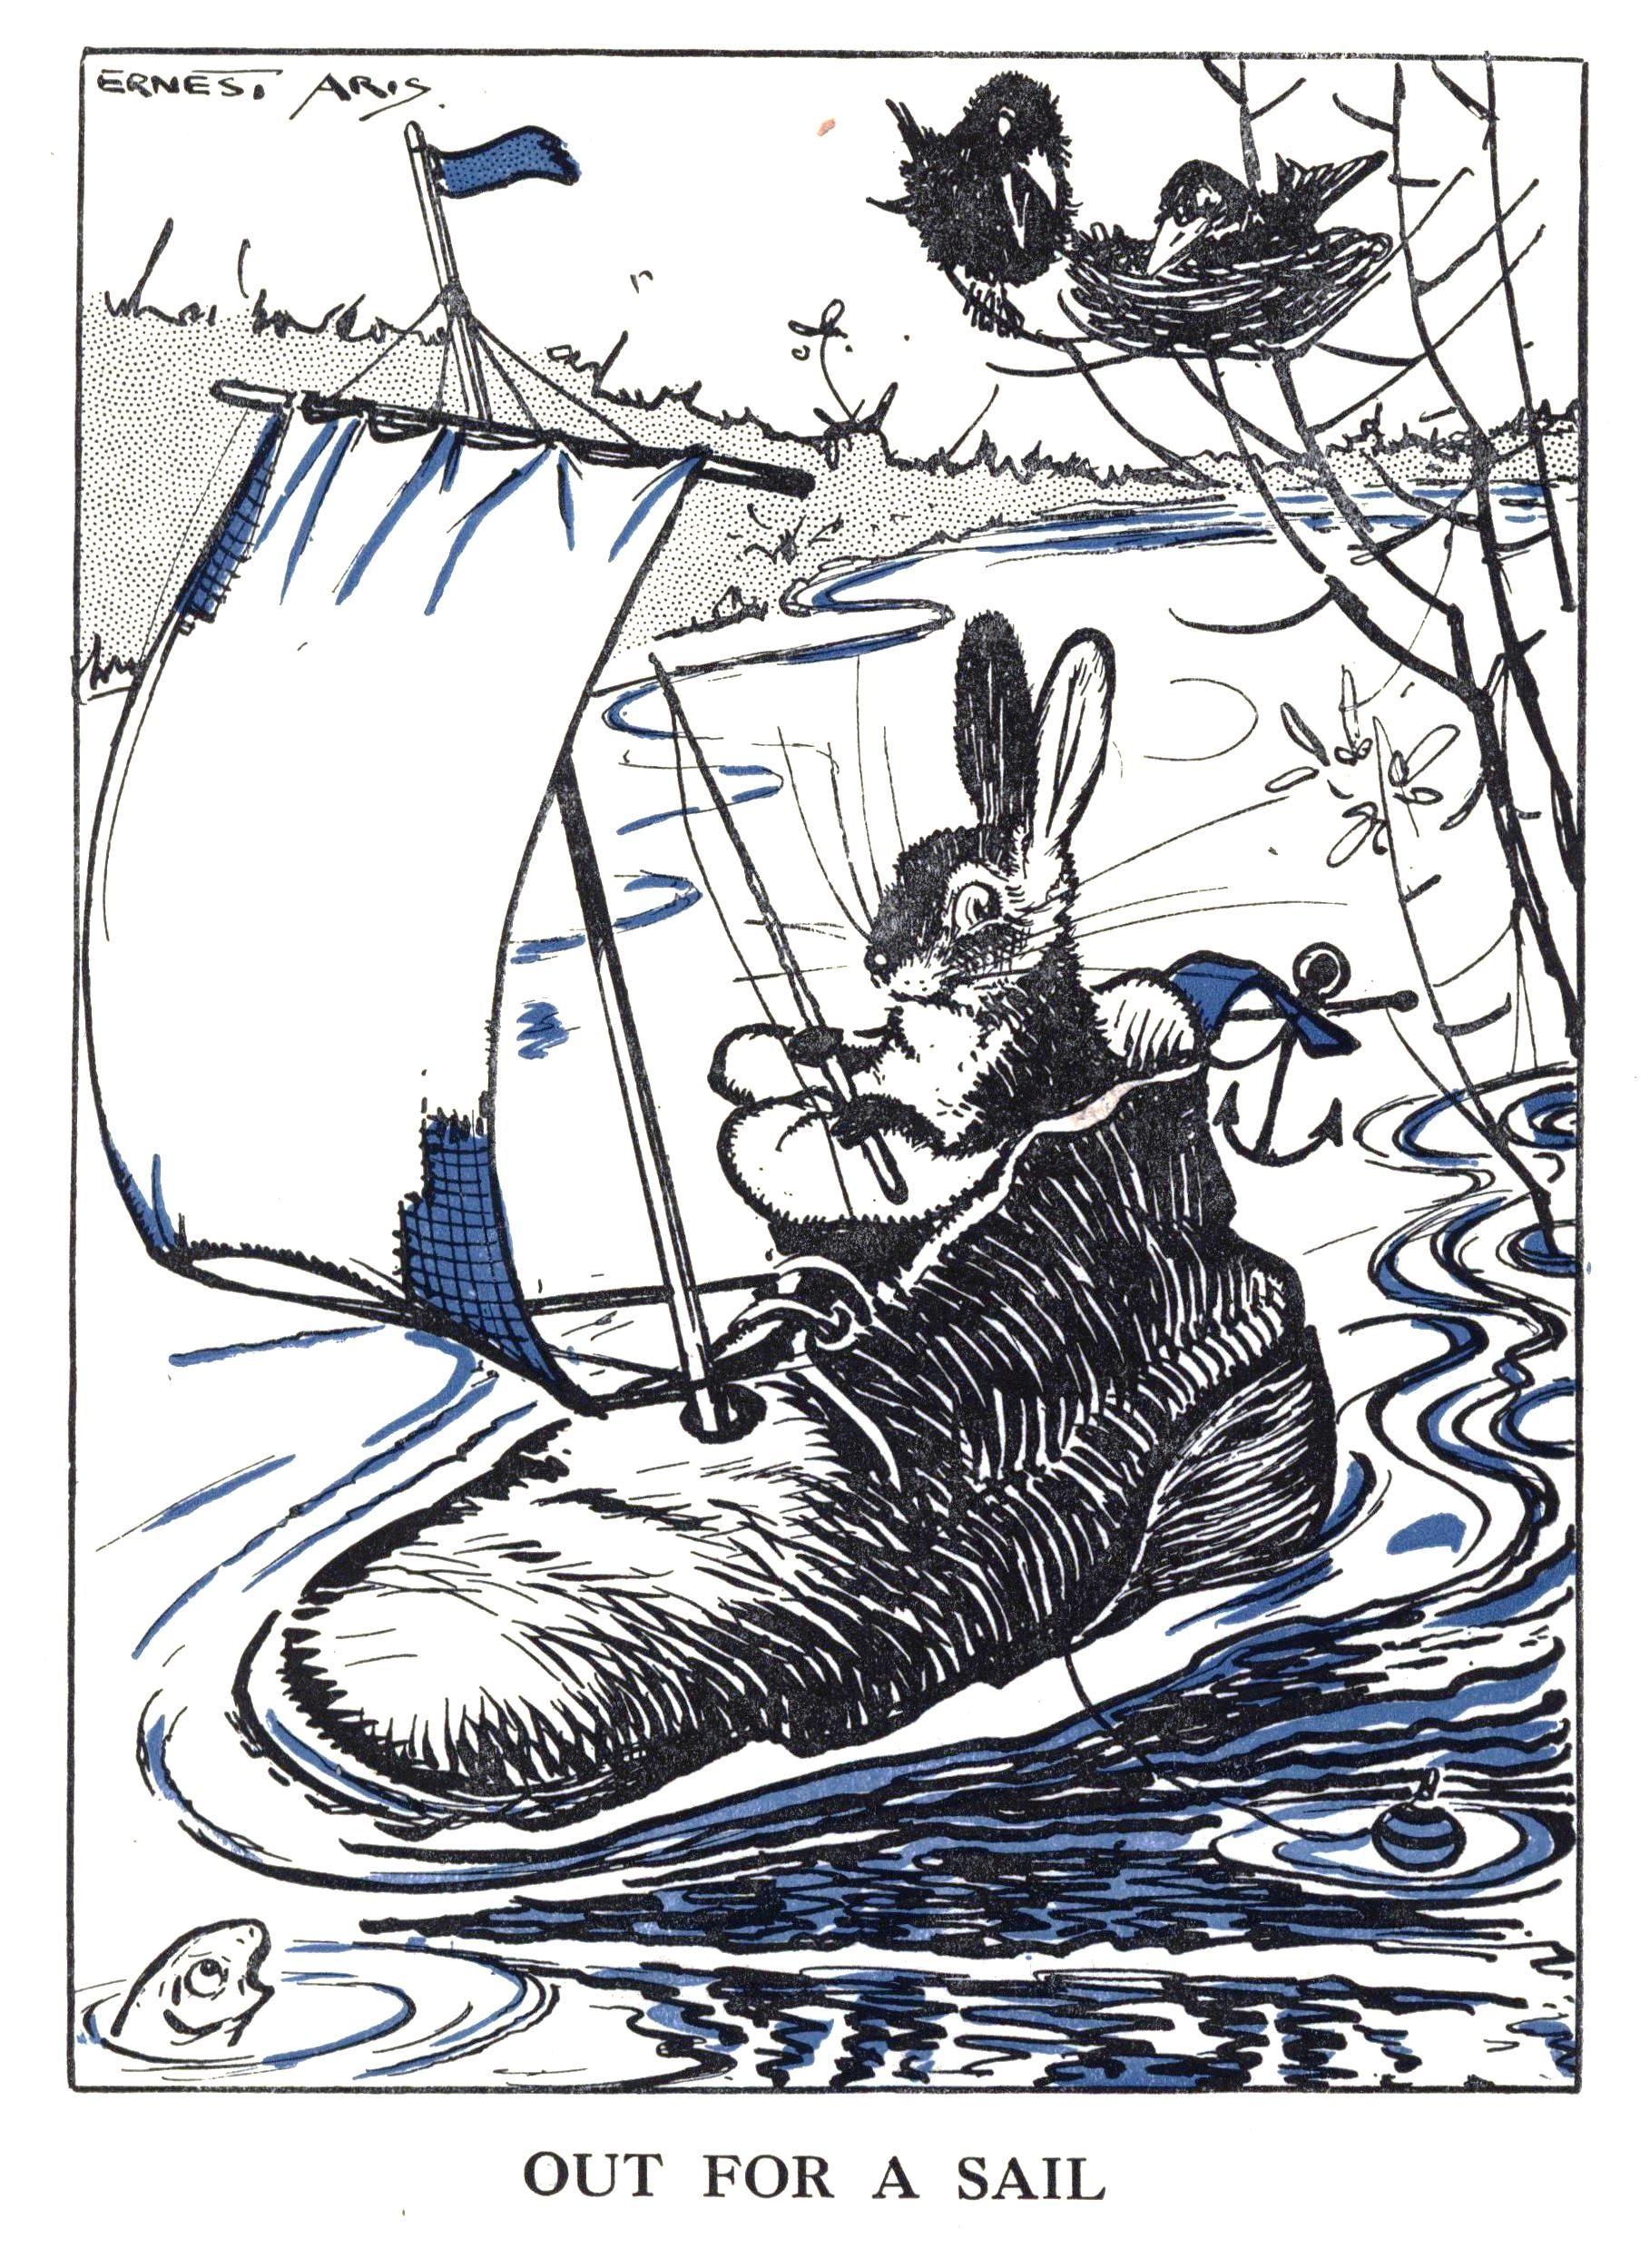 Ernest aris illustration childrens book illustration